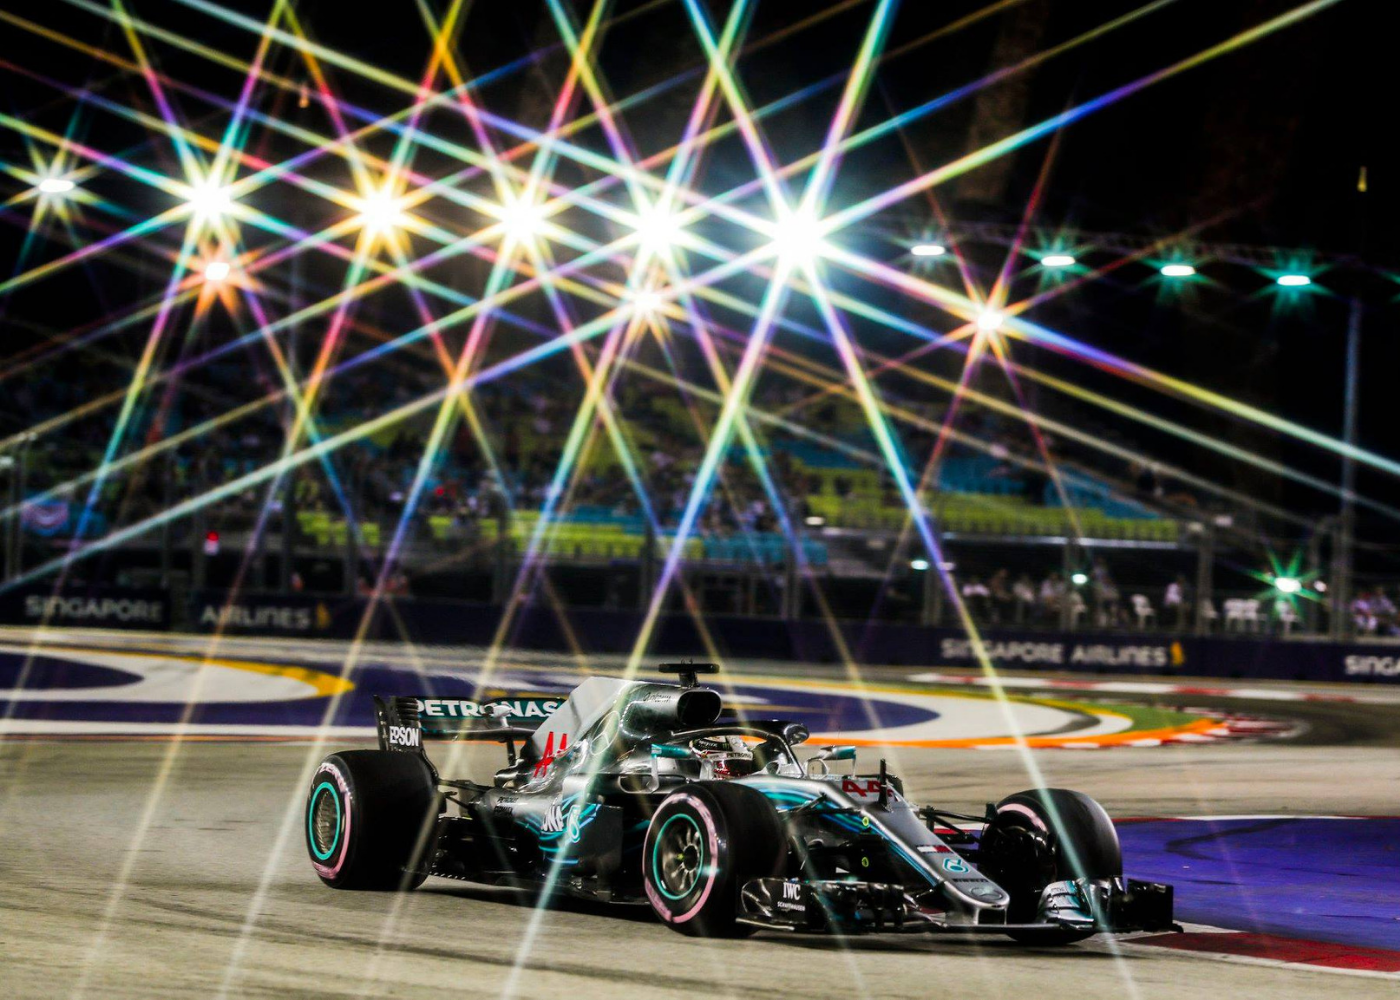 F1 Singapore Grand Prix 2019 guide